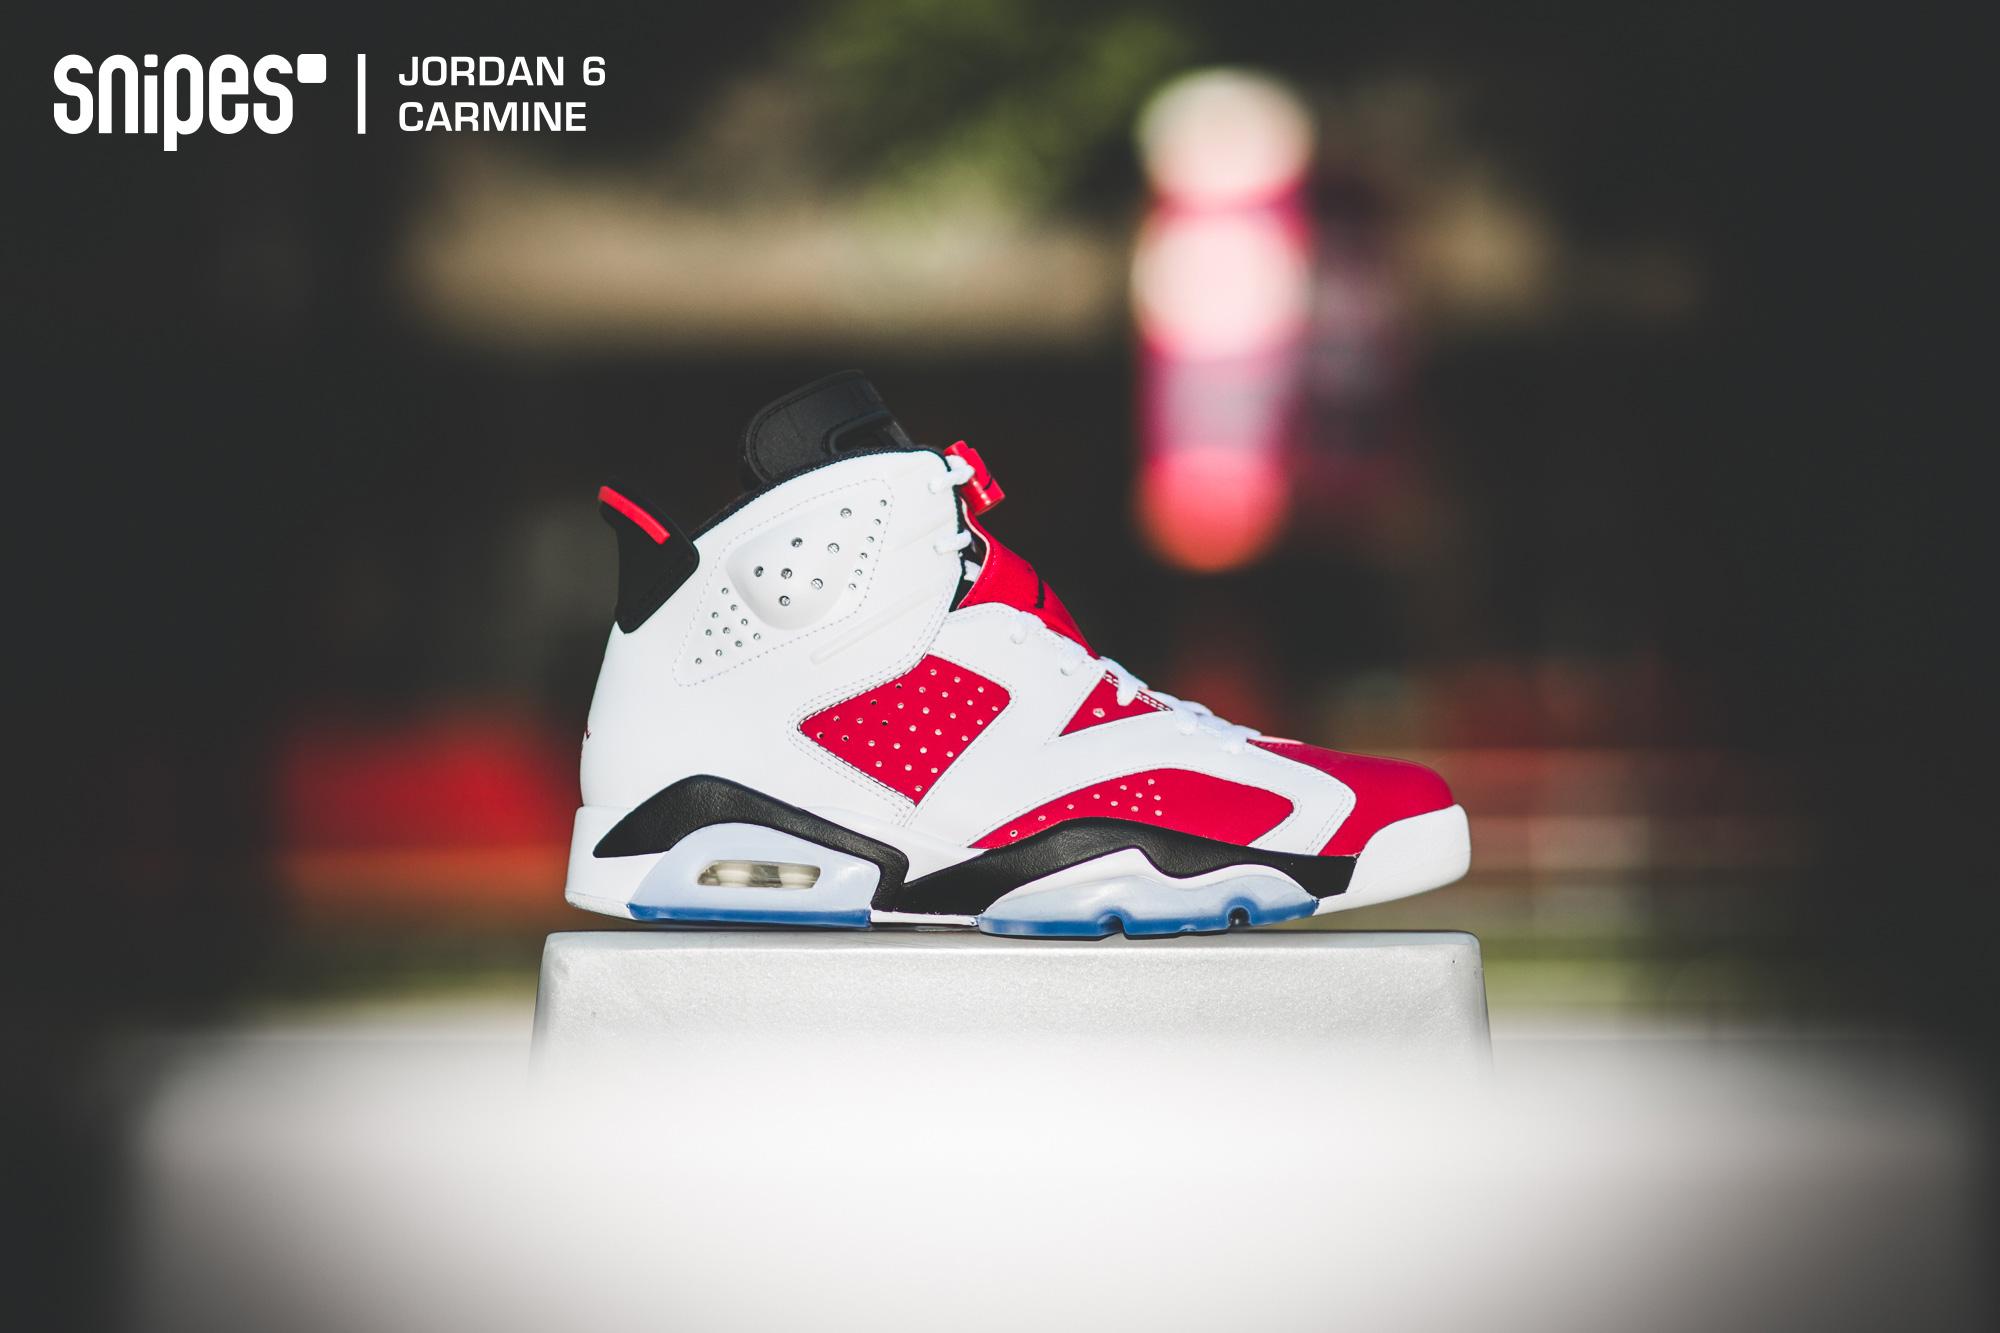 Air Jordan 6 Retro Carmine 2